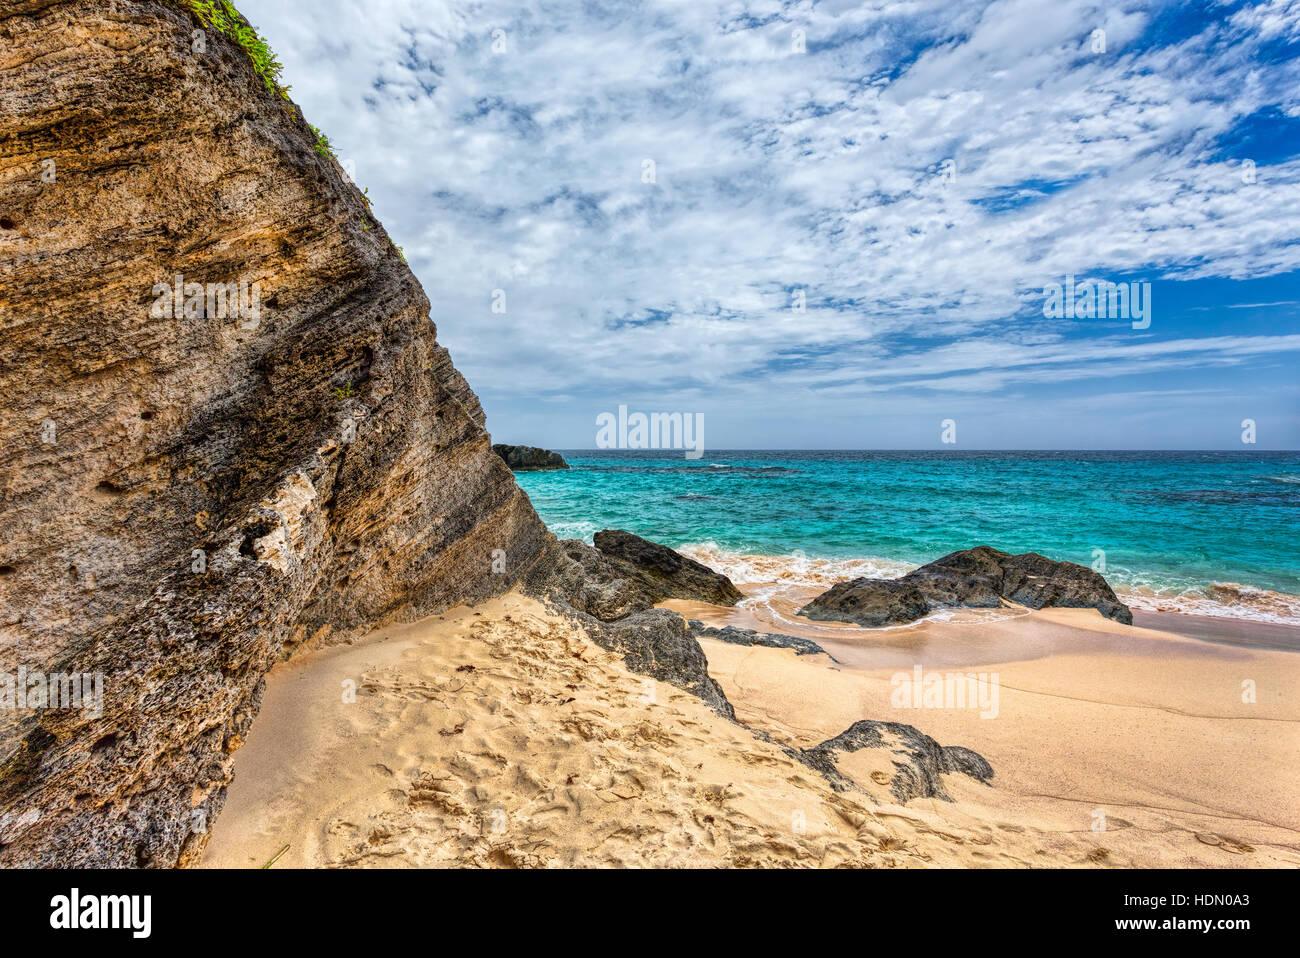 Landscape of Ocean, rock and beach in Horseshoe Bay, Southampton Parish, Bermuda - Stock Image